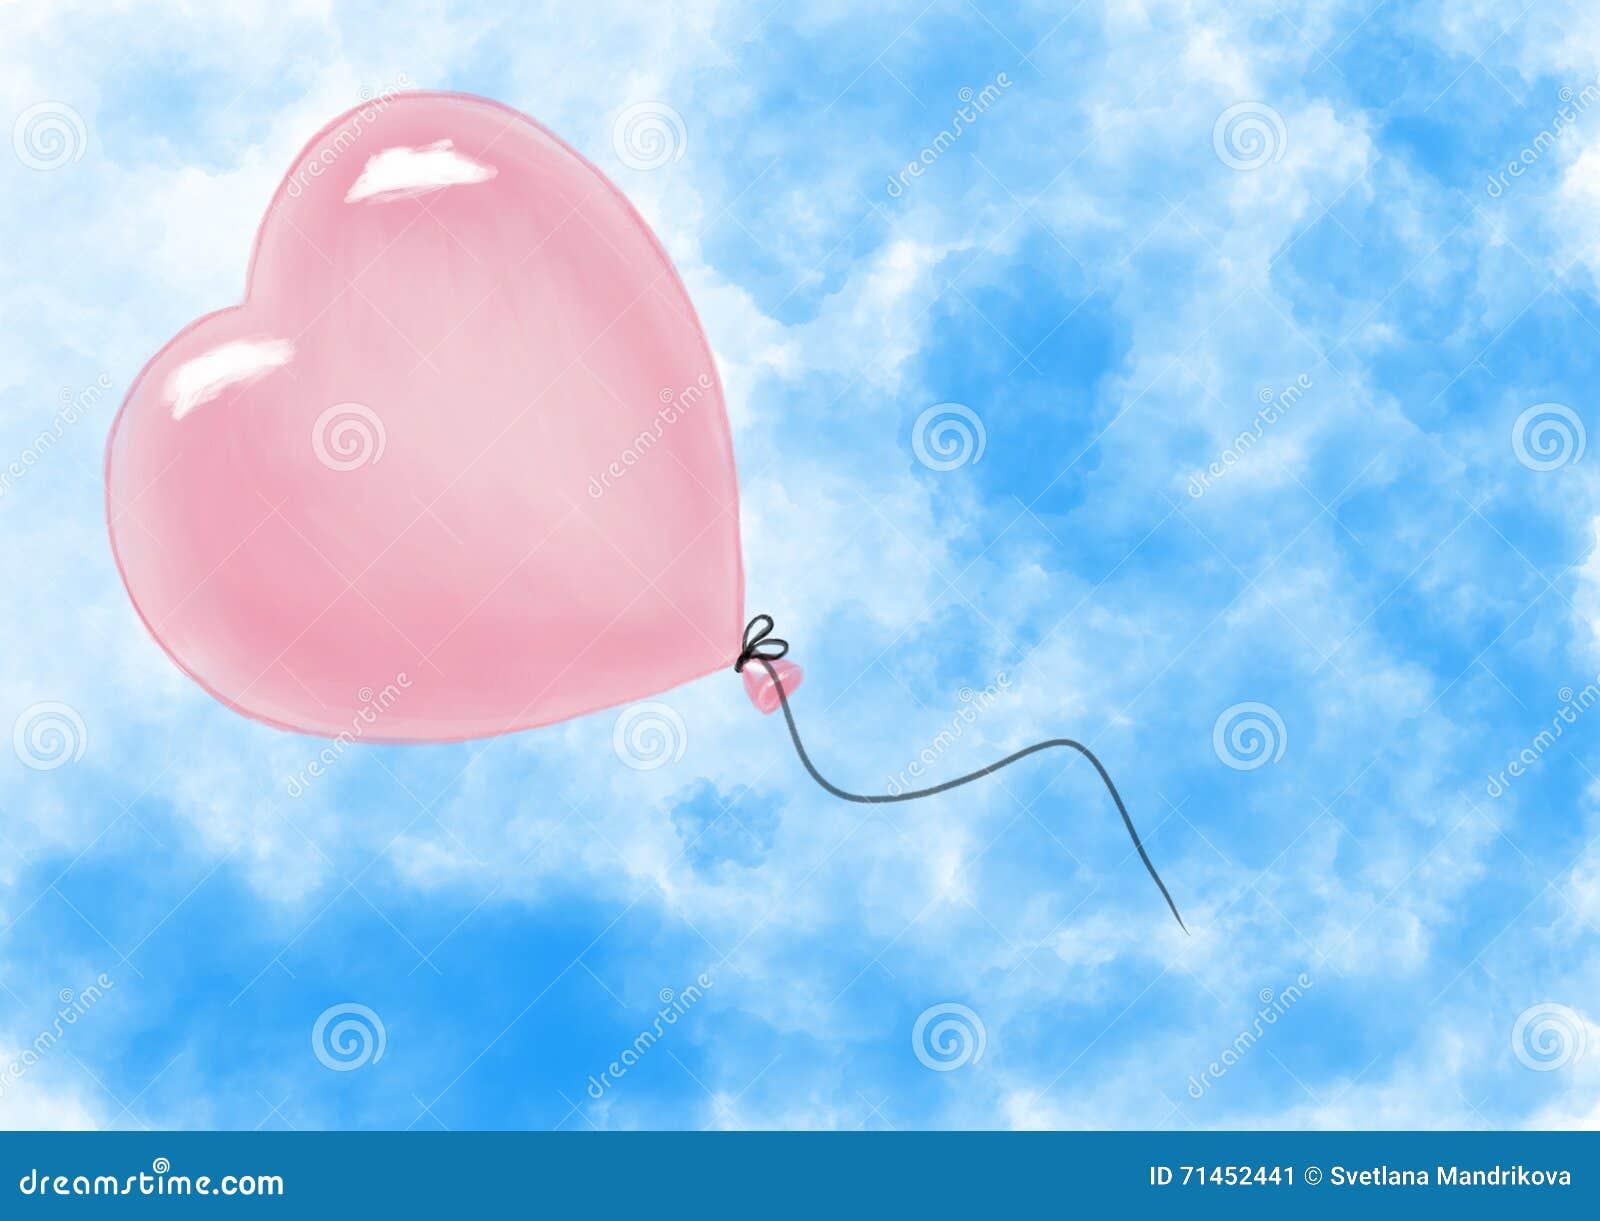 Ballon αέρα μορφής καρδιών που πετά στον ουρανό